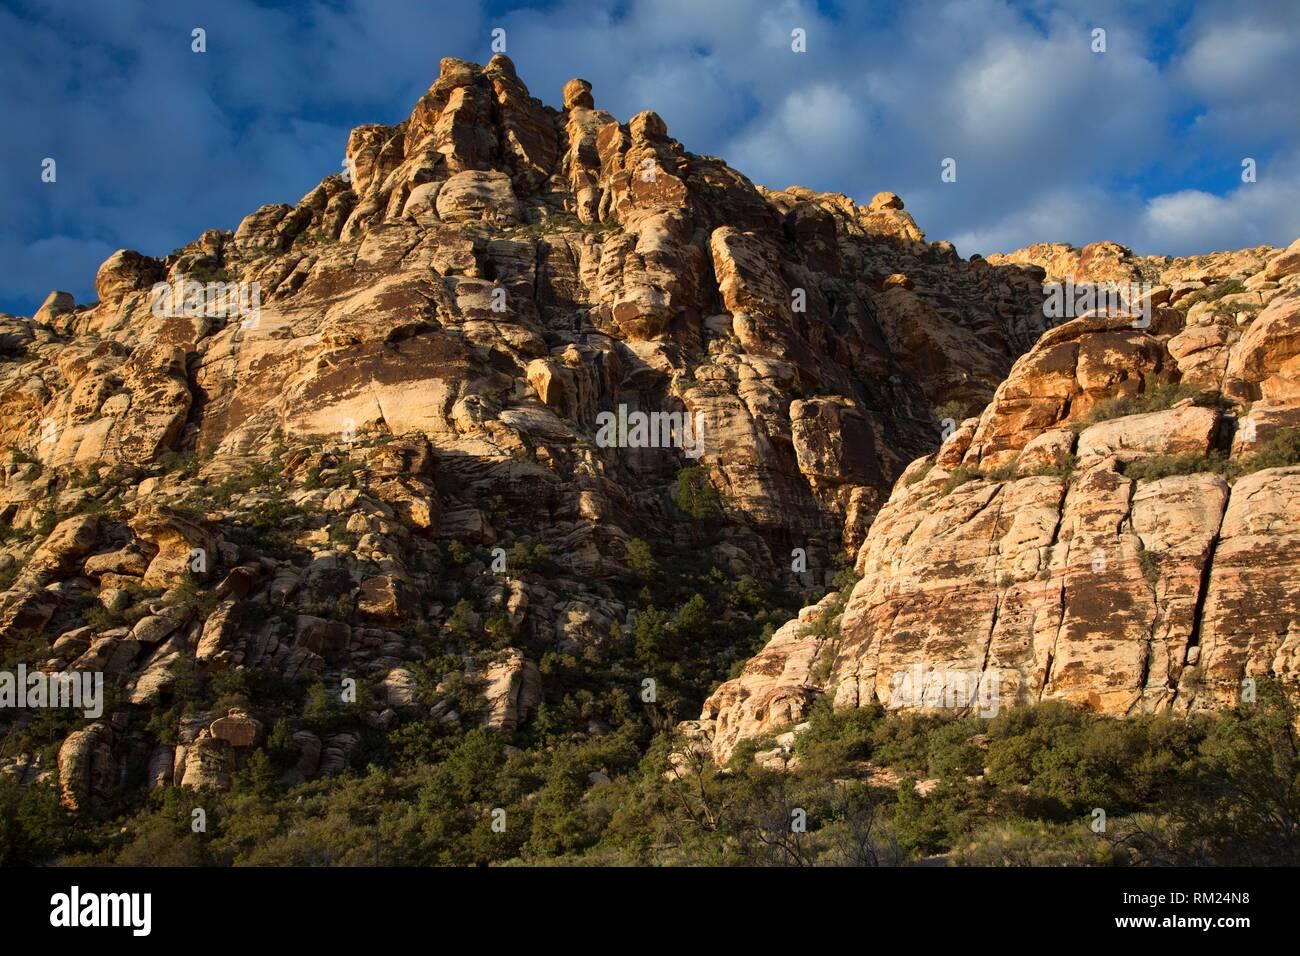 Sandstein Klippen an der Weide Frühjahr/Lost Creek, Red Rock Canyon National Conservation Area, Nevada. Stockbild